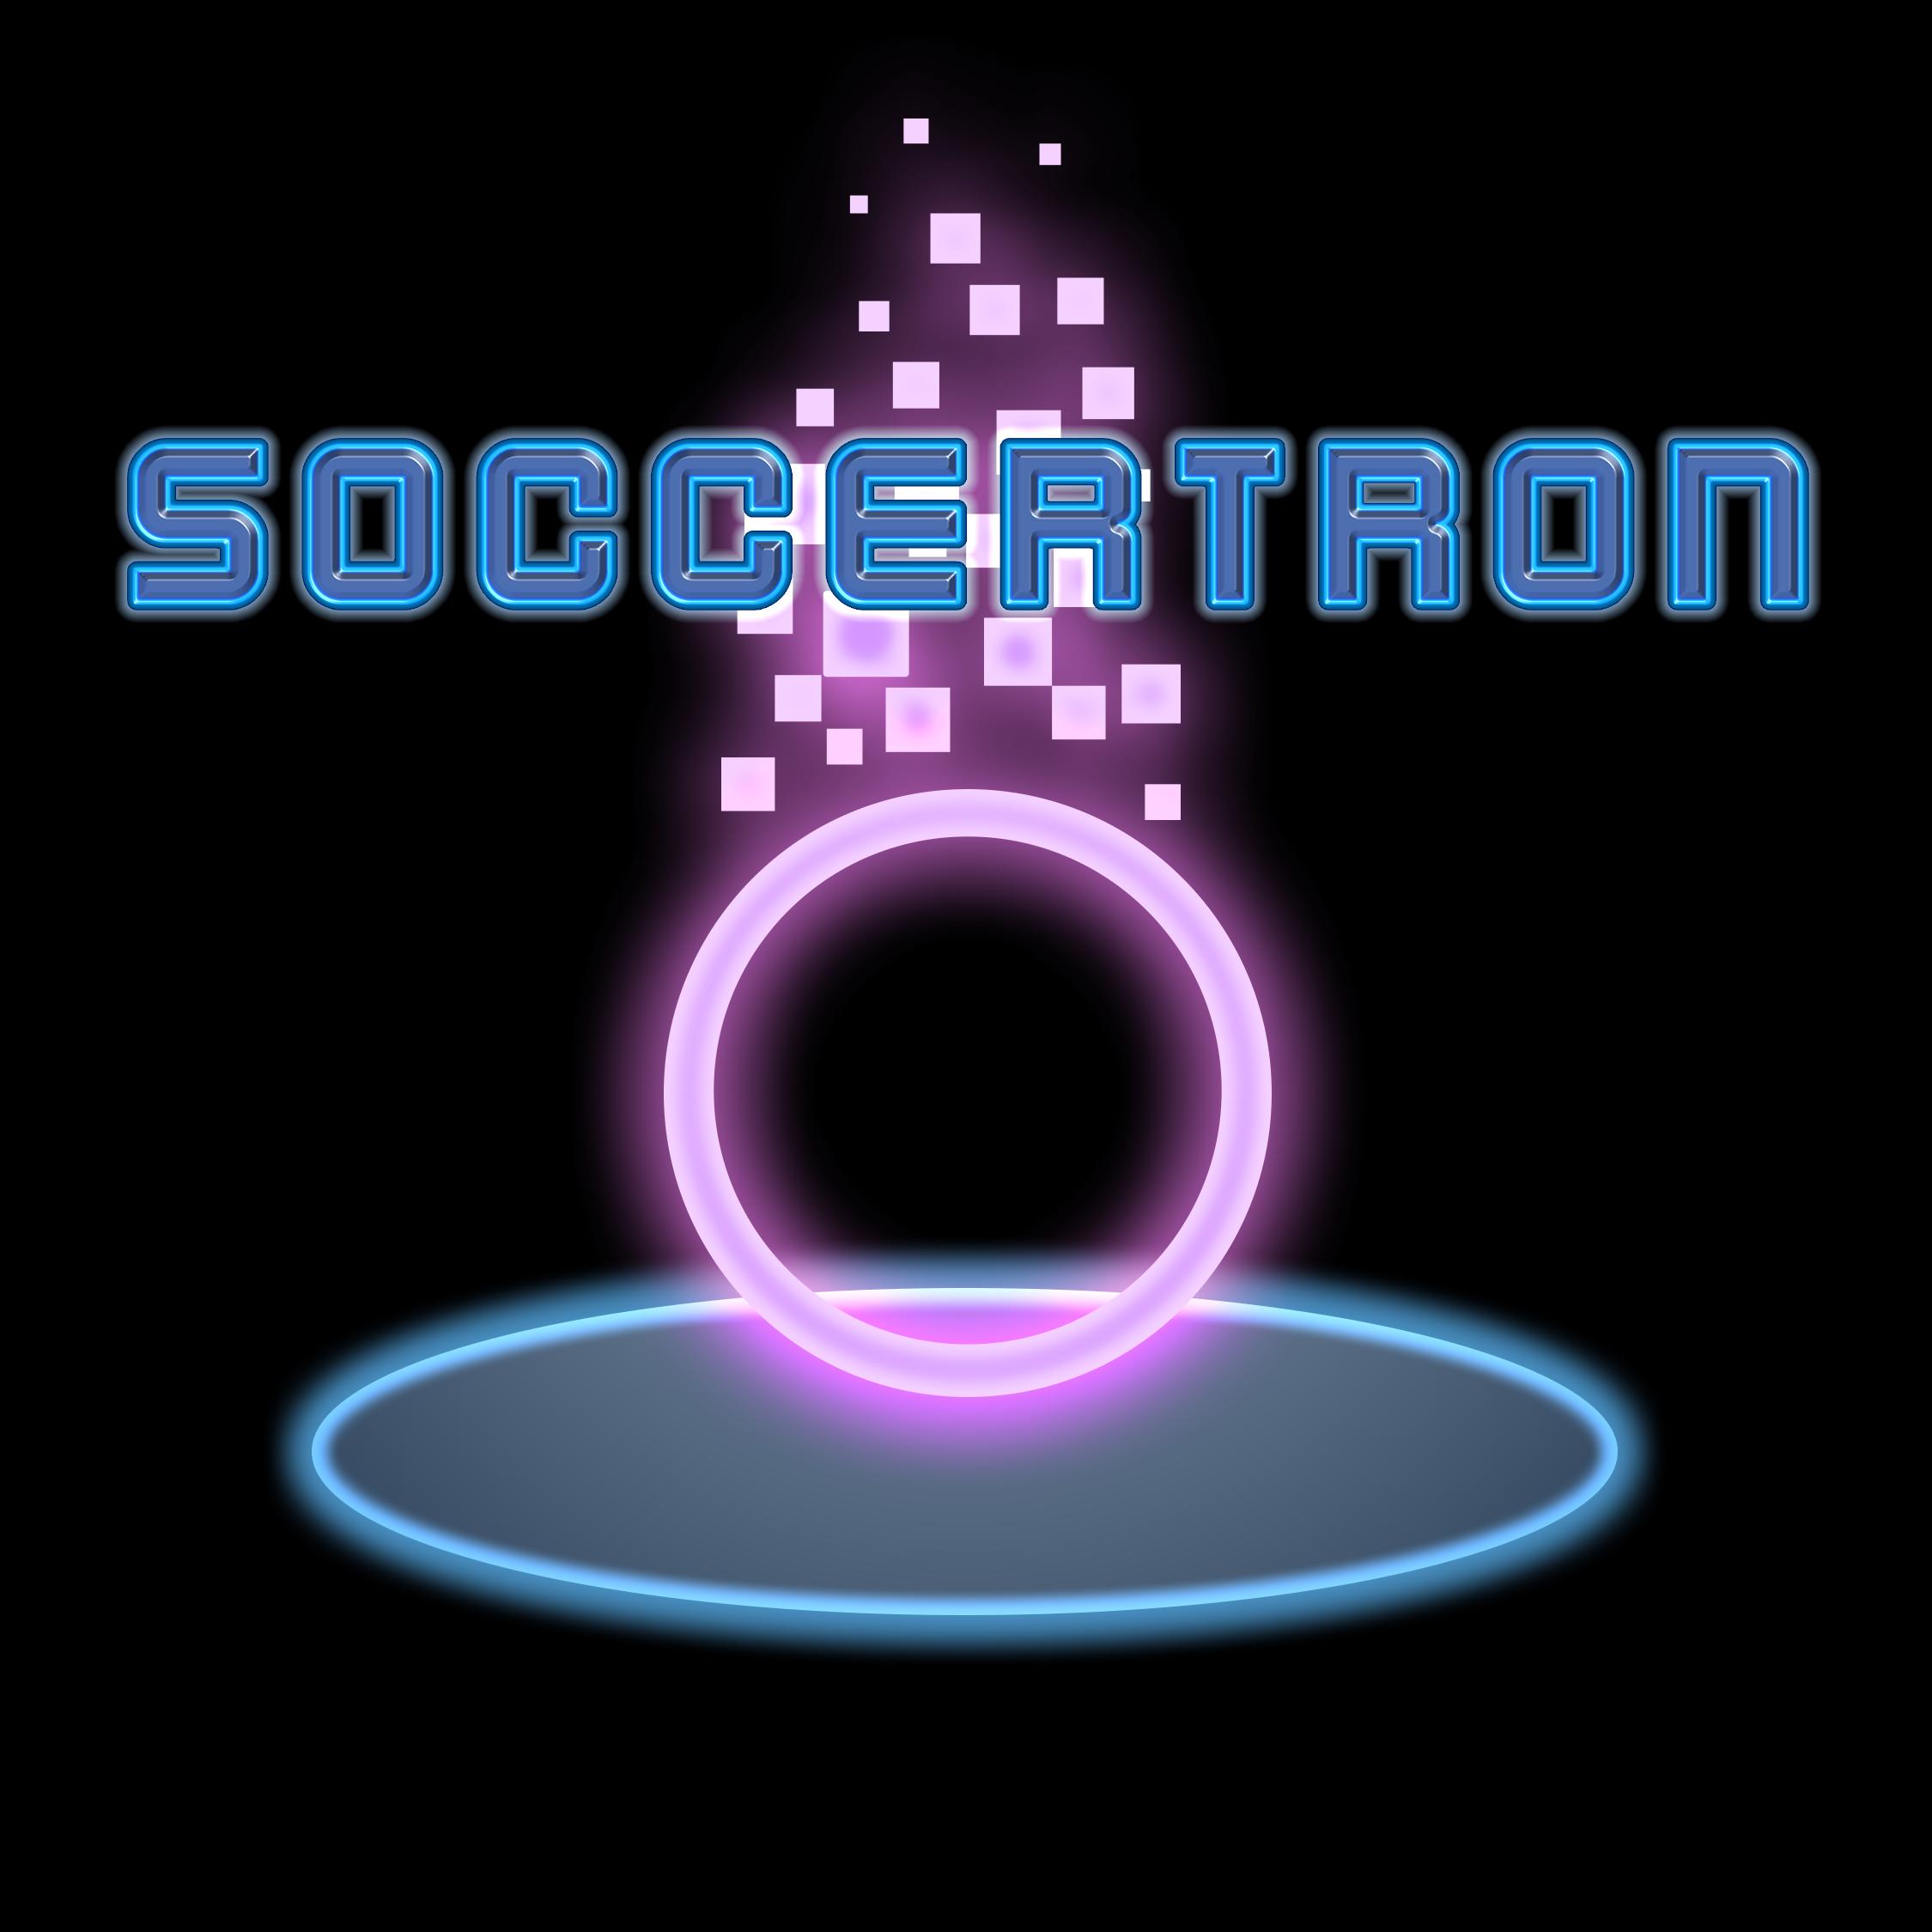 Soccertron